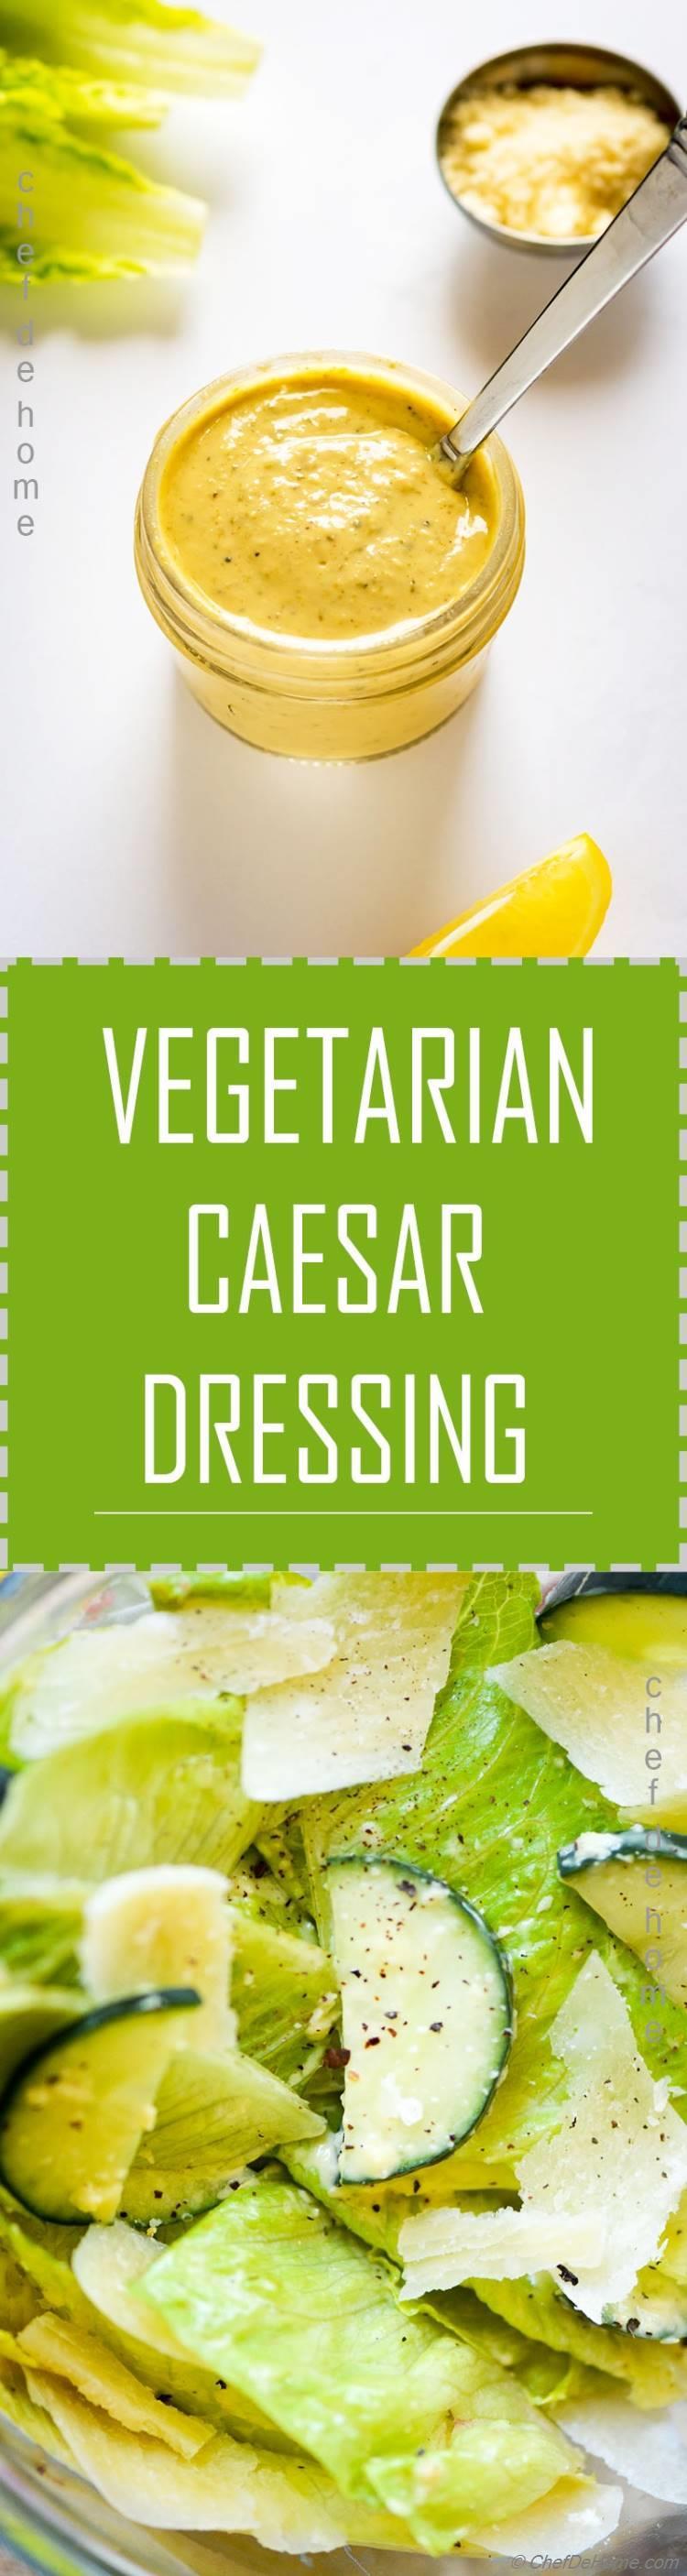 Caesar dressing coated lettuce and cucumber salad